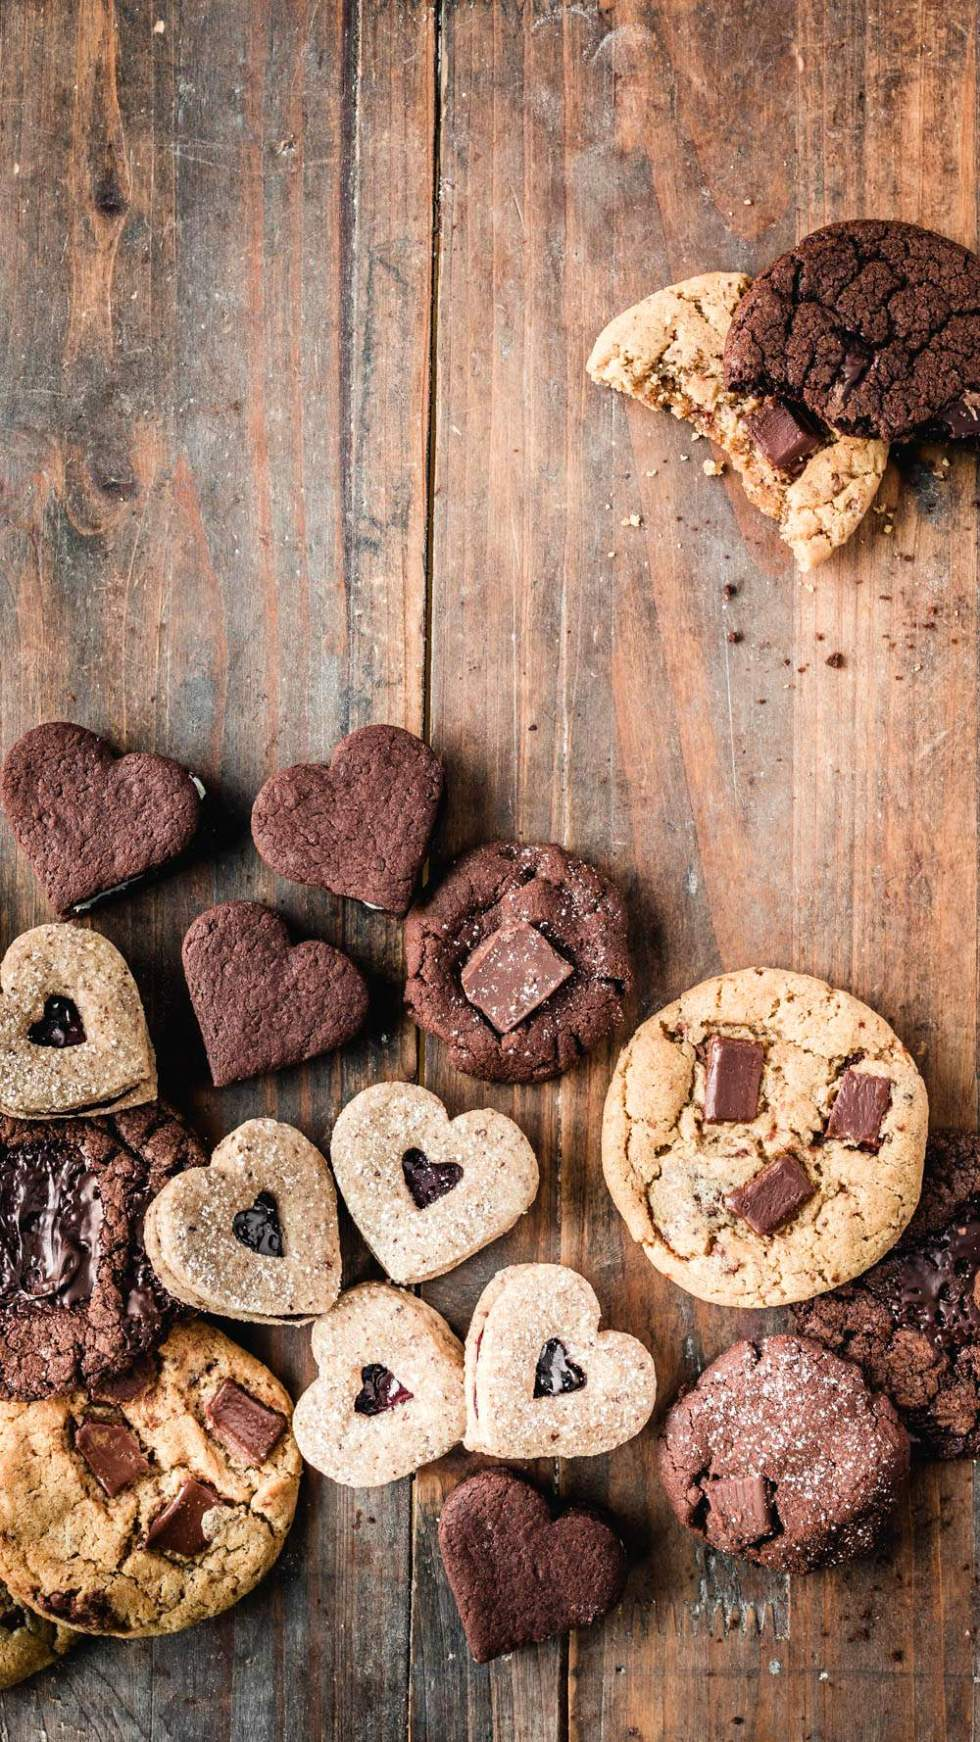 Fantastic Vegan Cookies - How to get a cookbook deal